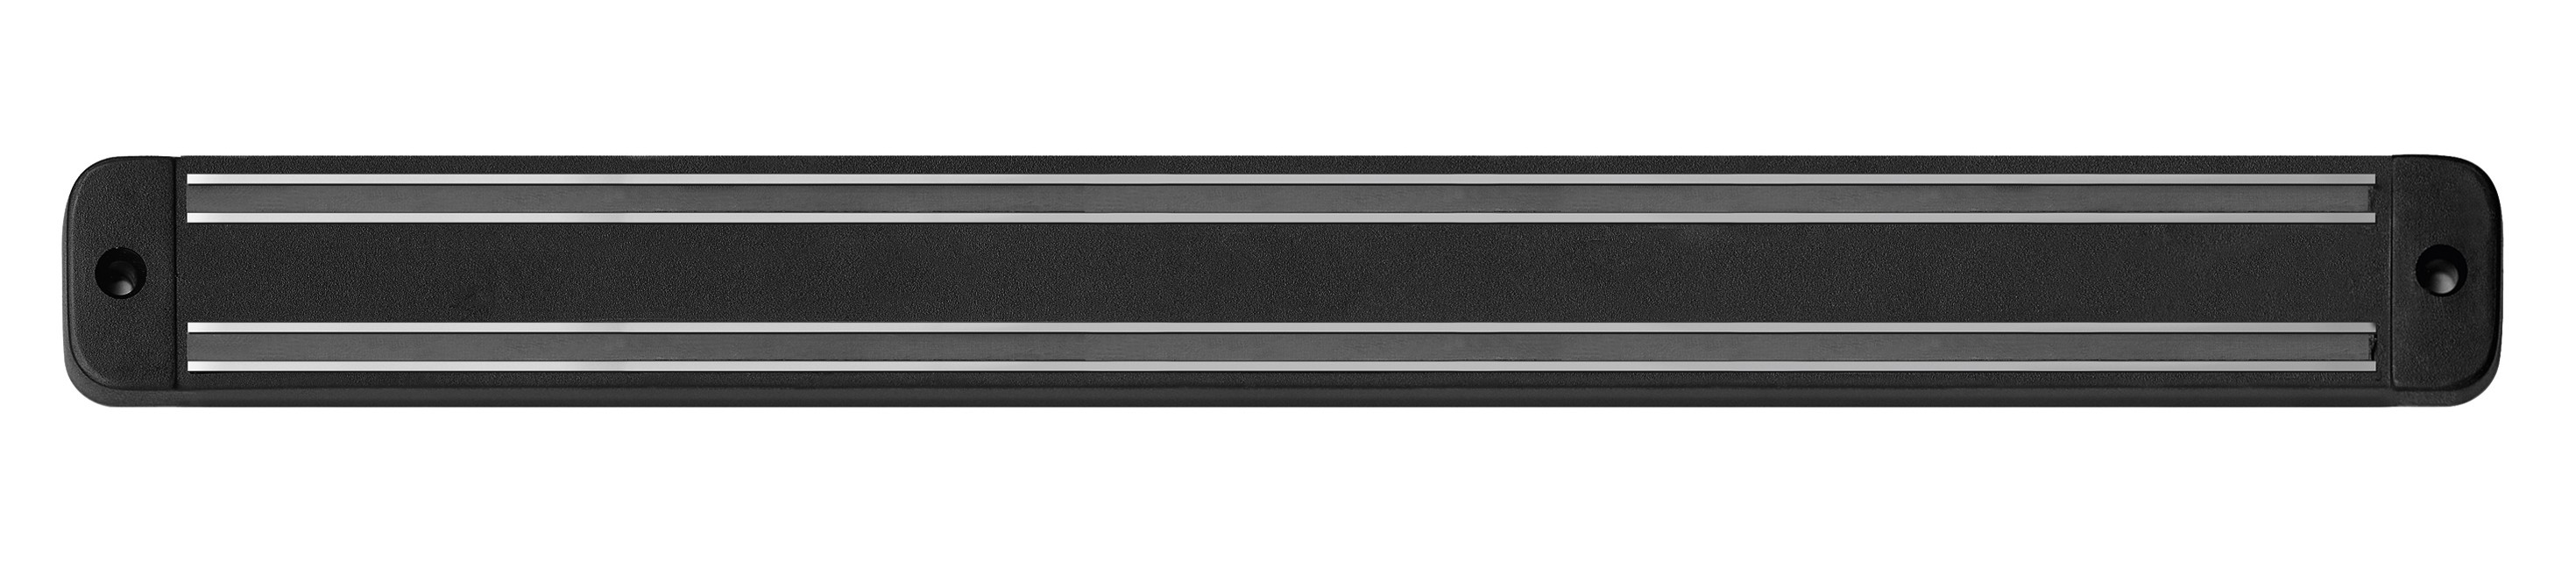 STAR Magnetleiste 33 cm